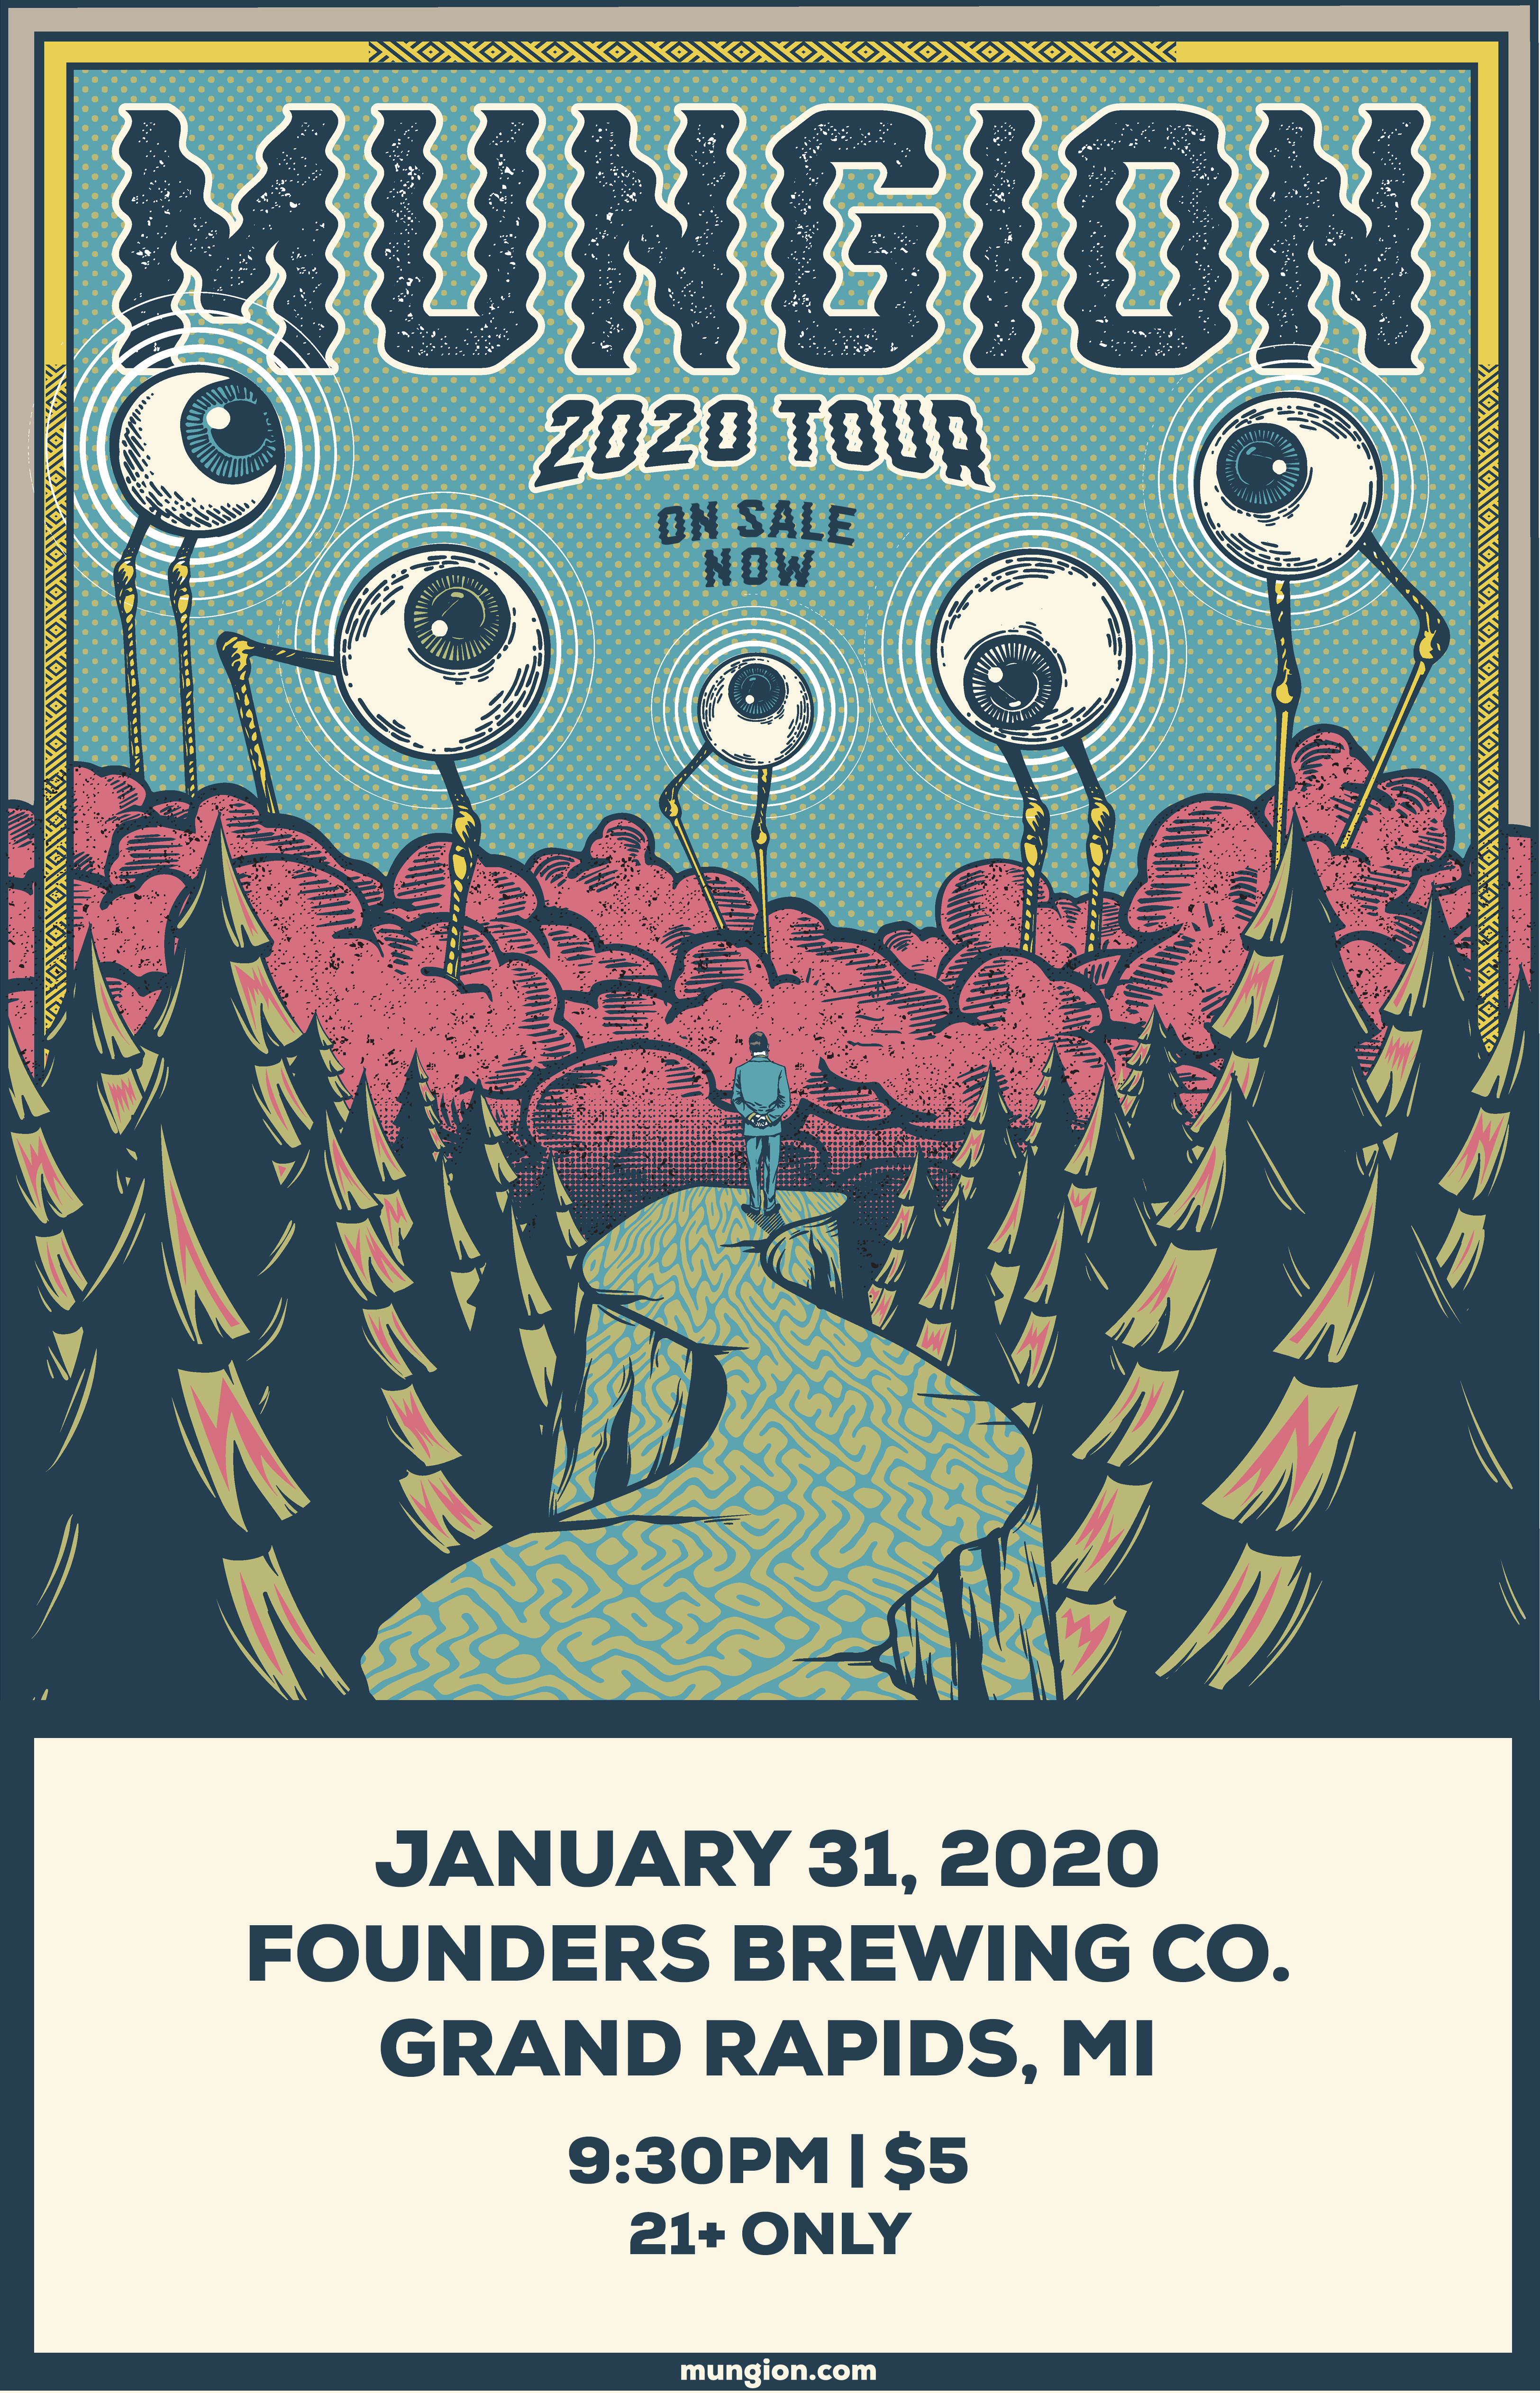 Mungion 2020 Tour event poster